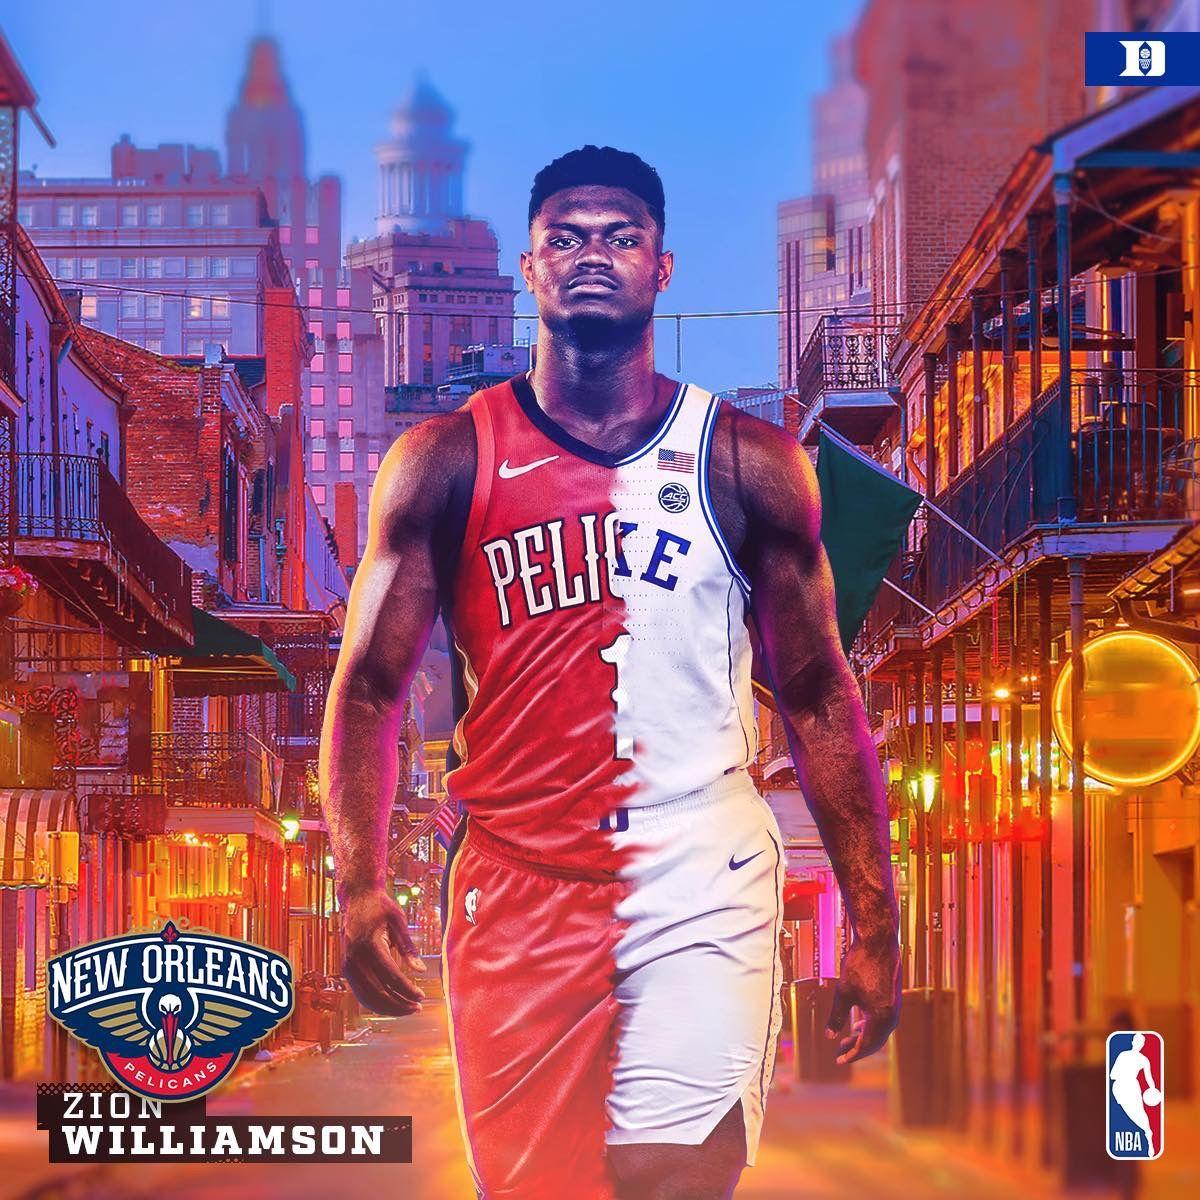 Zion Williamson Best nba players, Williamson, Kobe